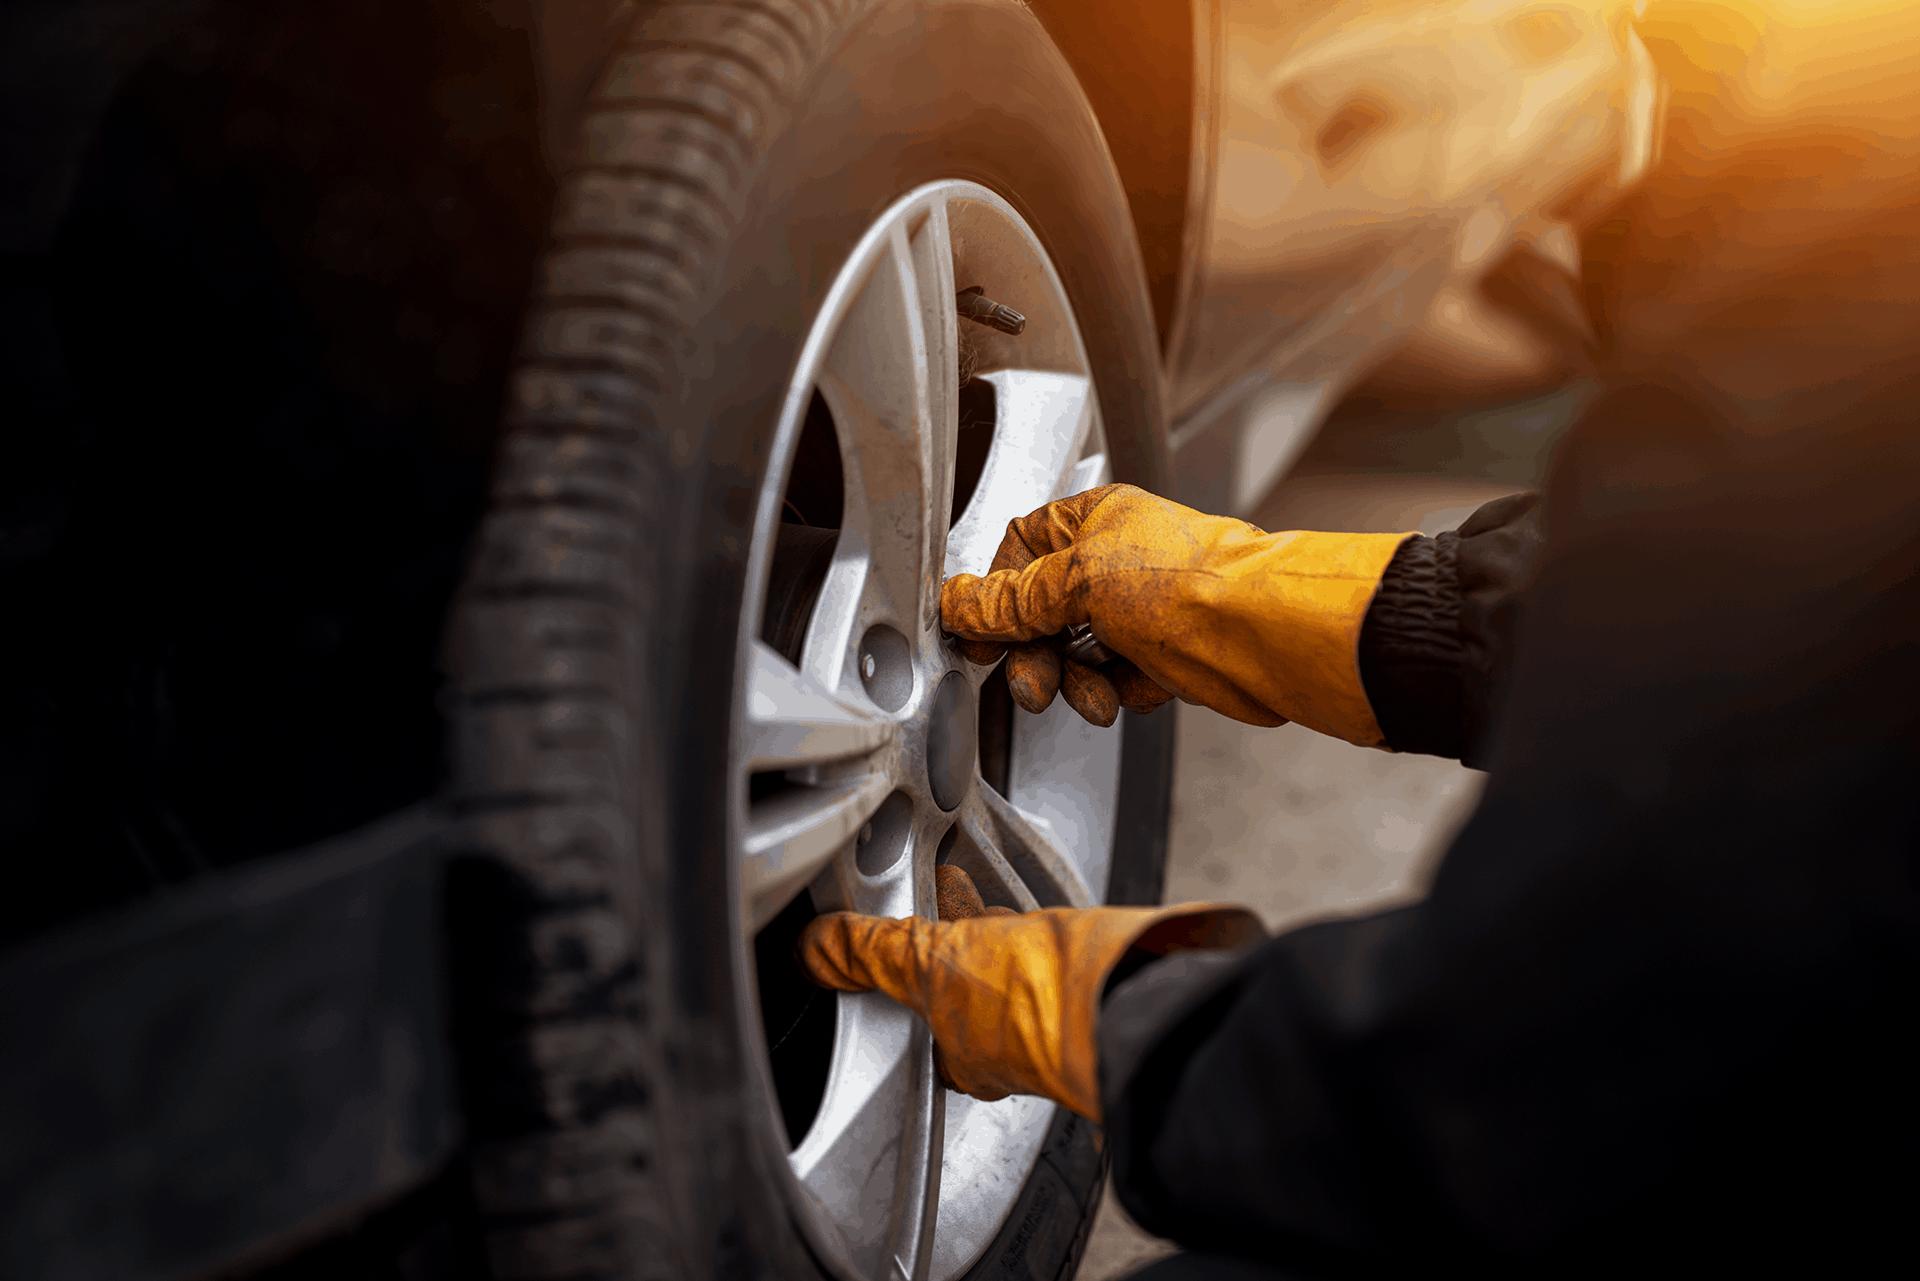 Tyre fitting at John Delany Motors